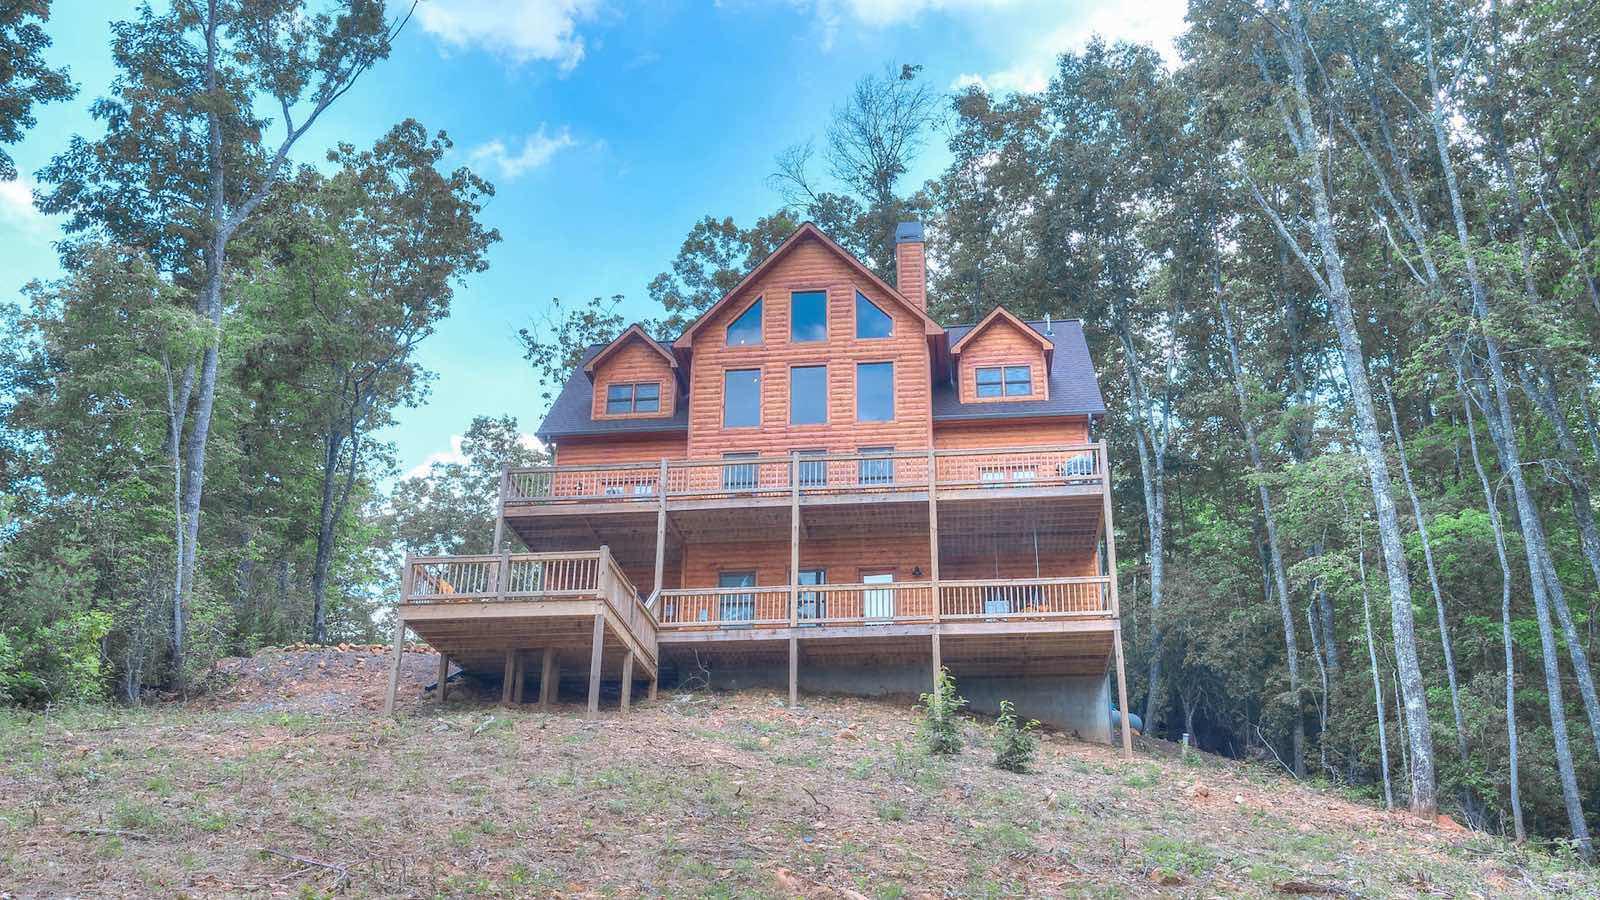 Echo lodge rental cabin blue ridge ga for Rental cabins in ga